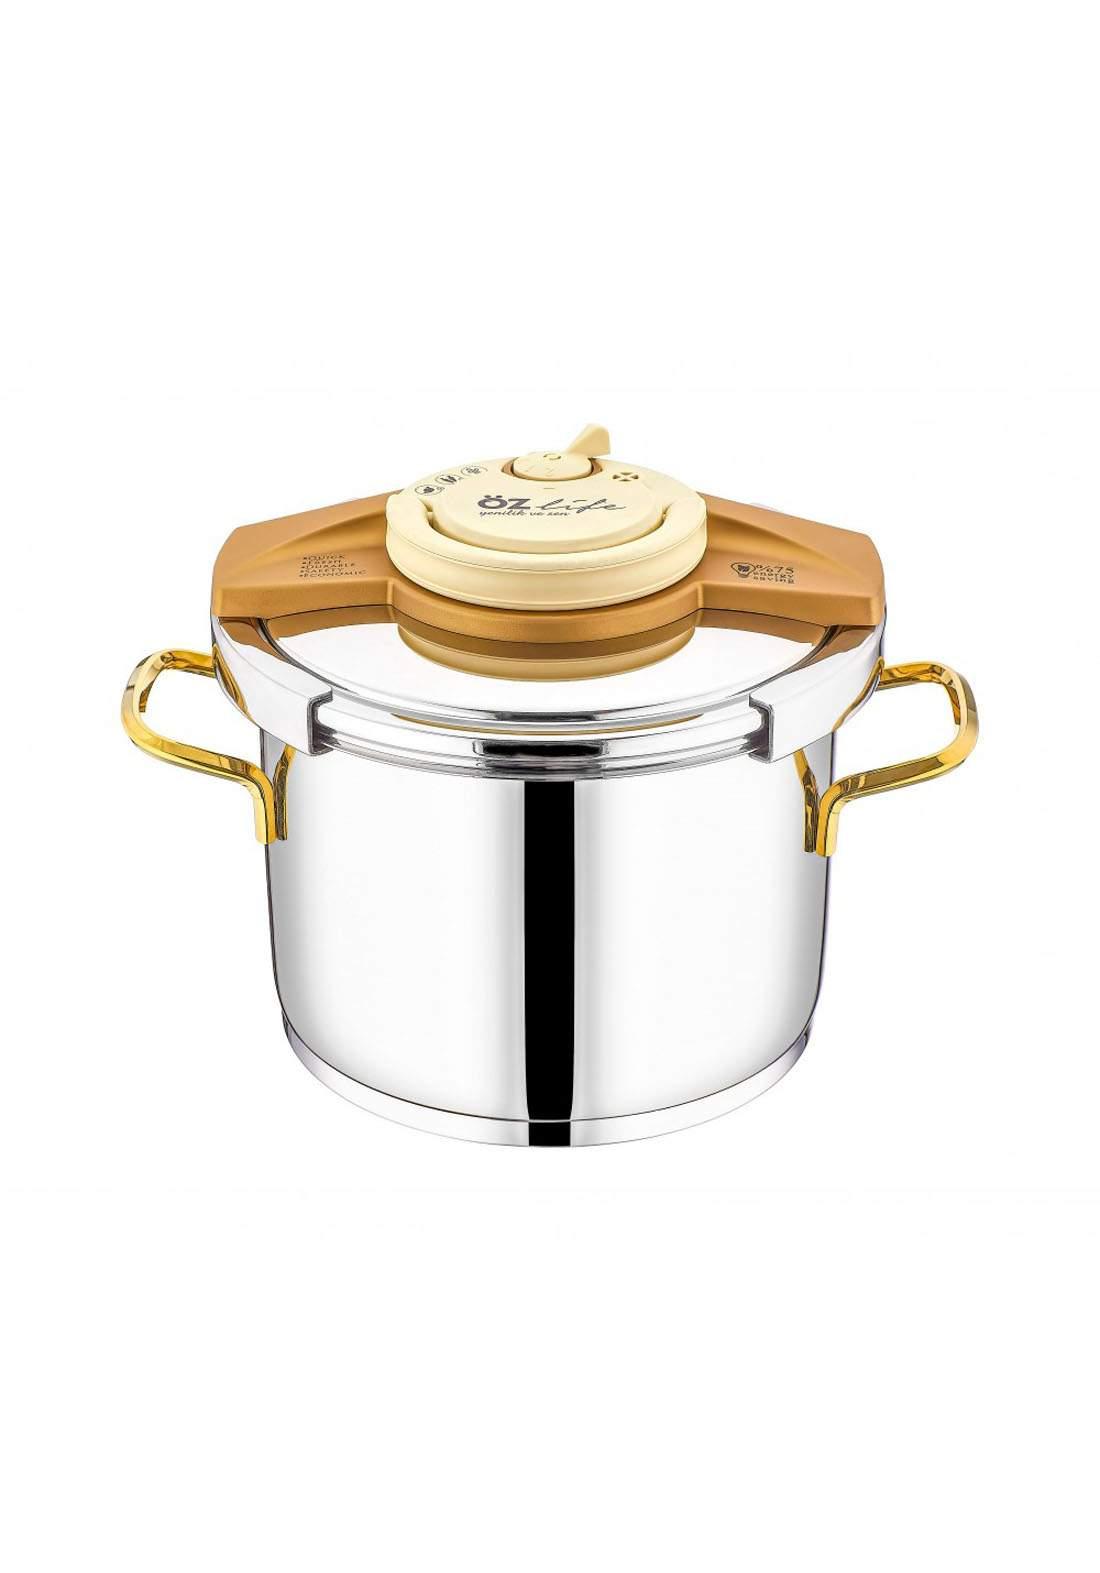 Ozlife Pressure Cooker Gold 2 Piece  قدر ضغط